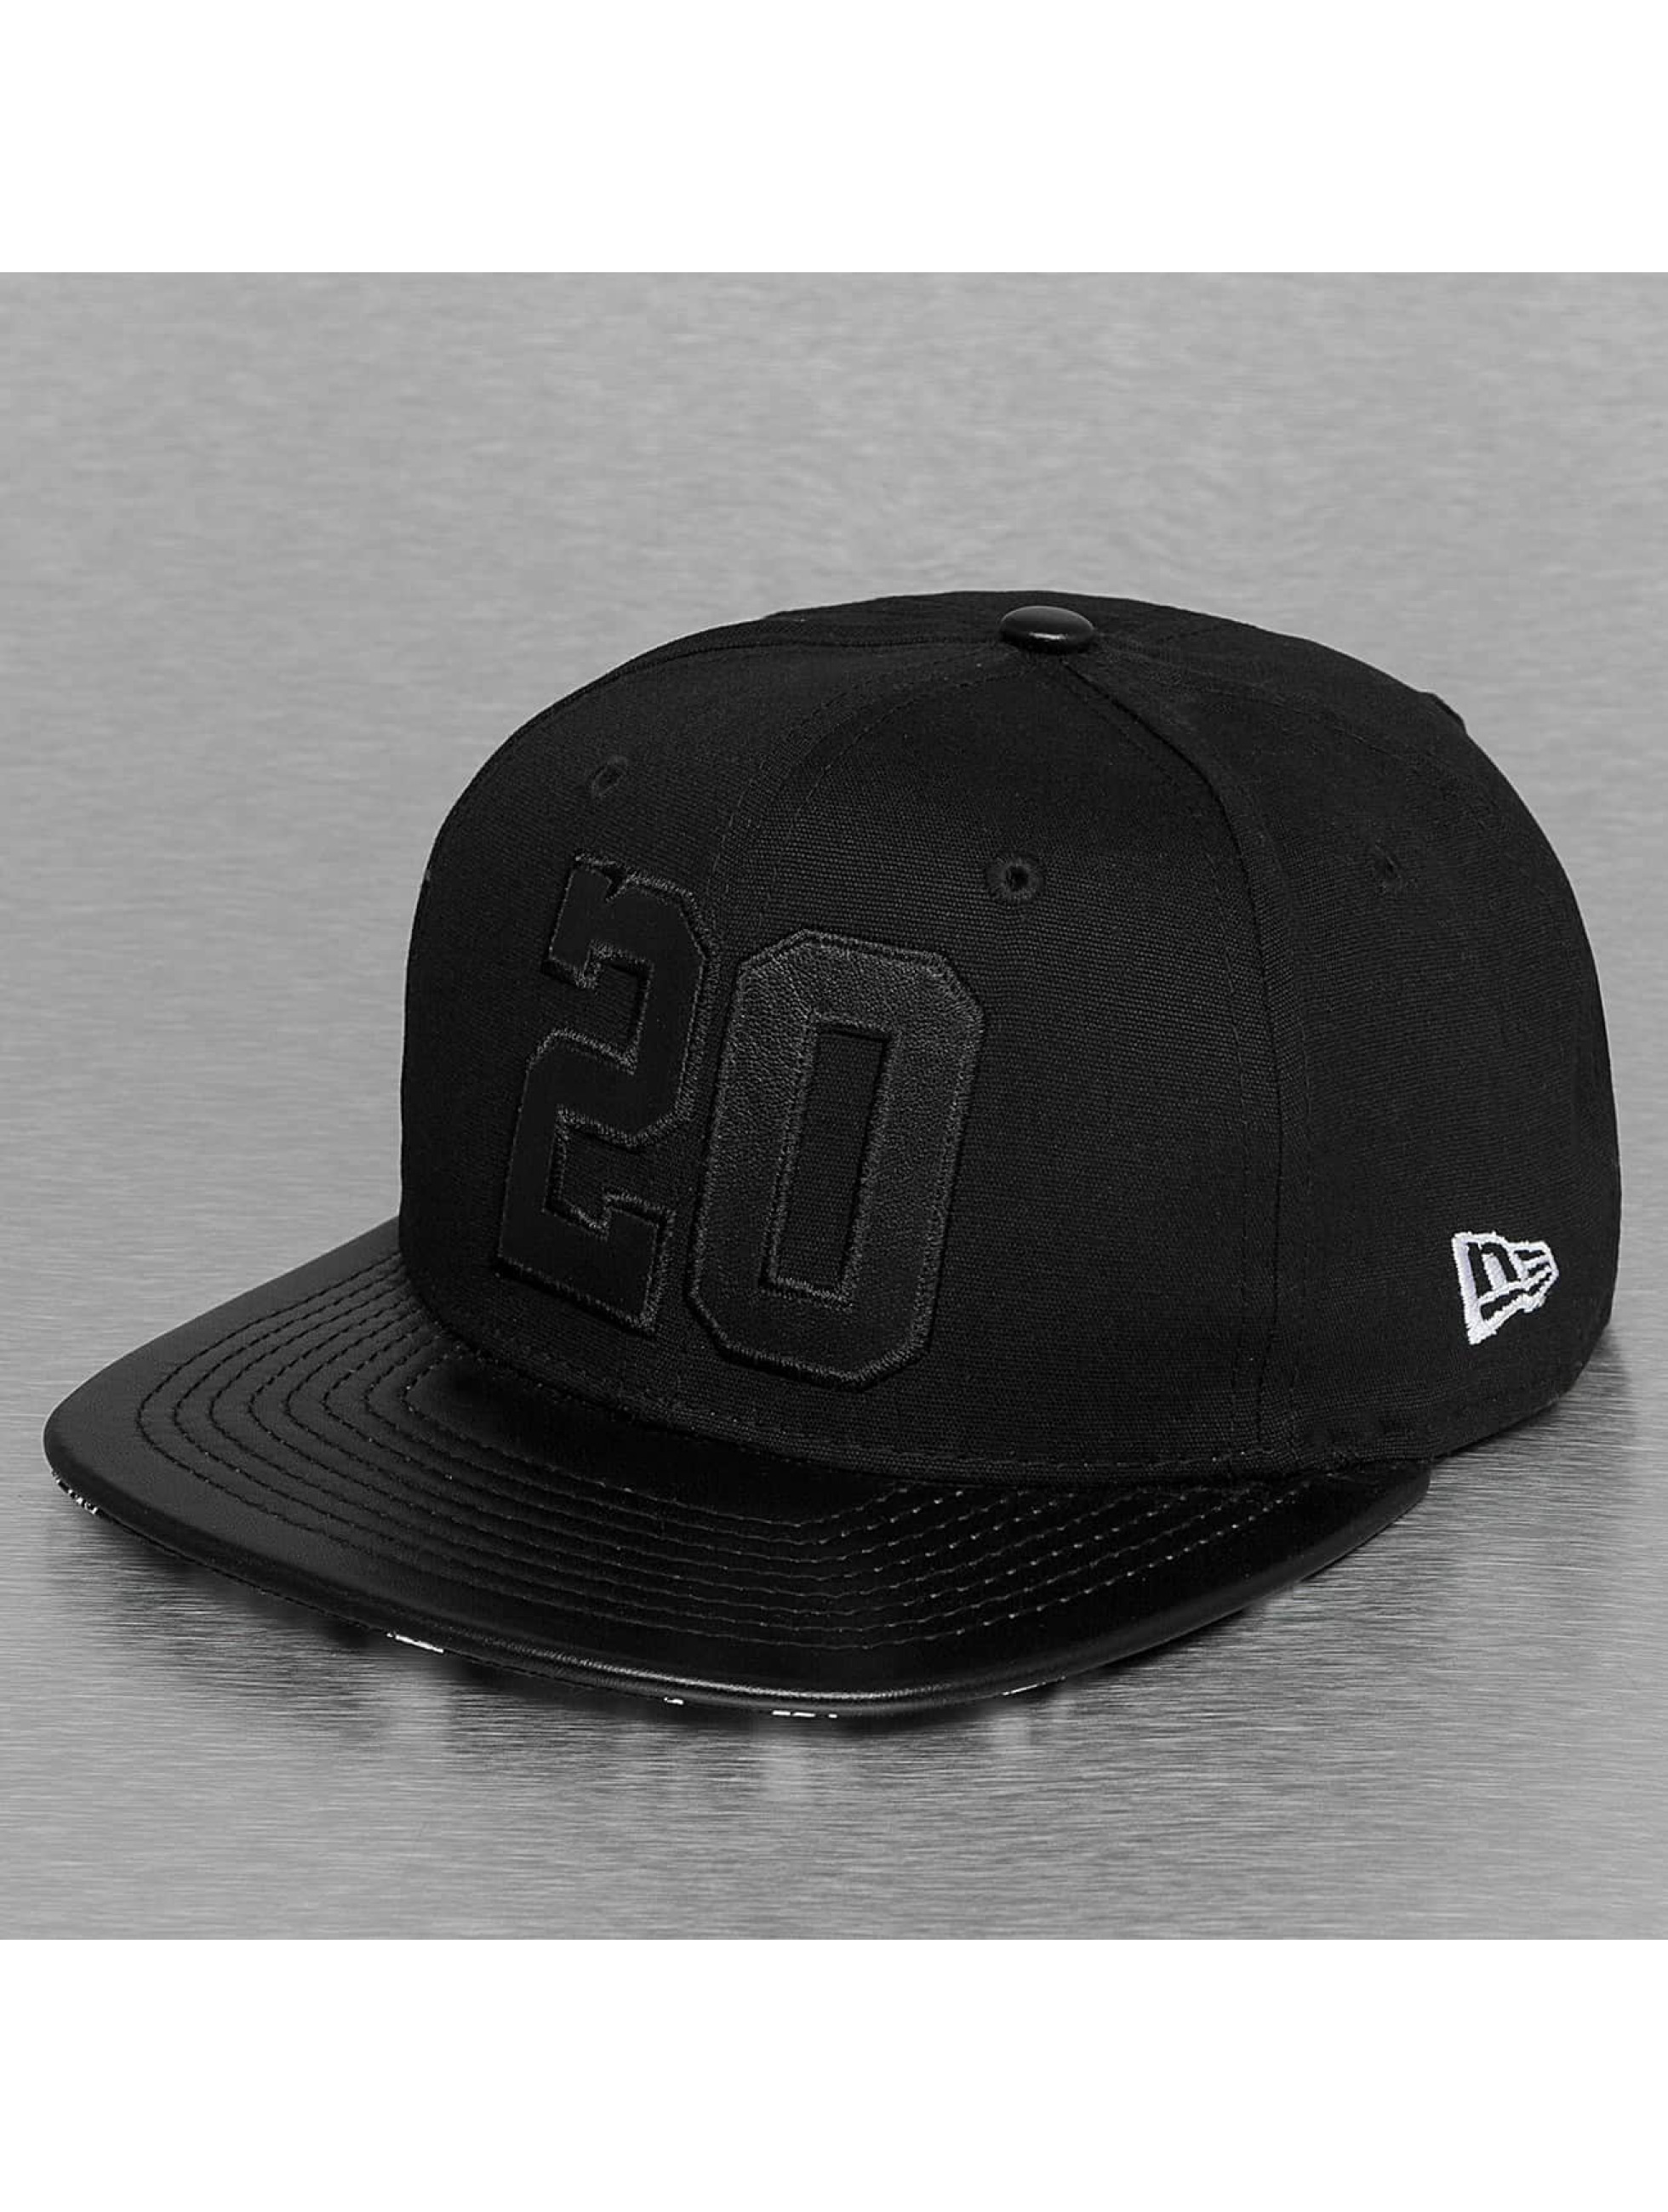 New Era Snapback Cap Leather Twenty 9Fifty black